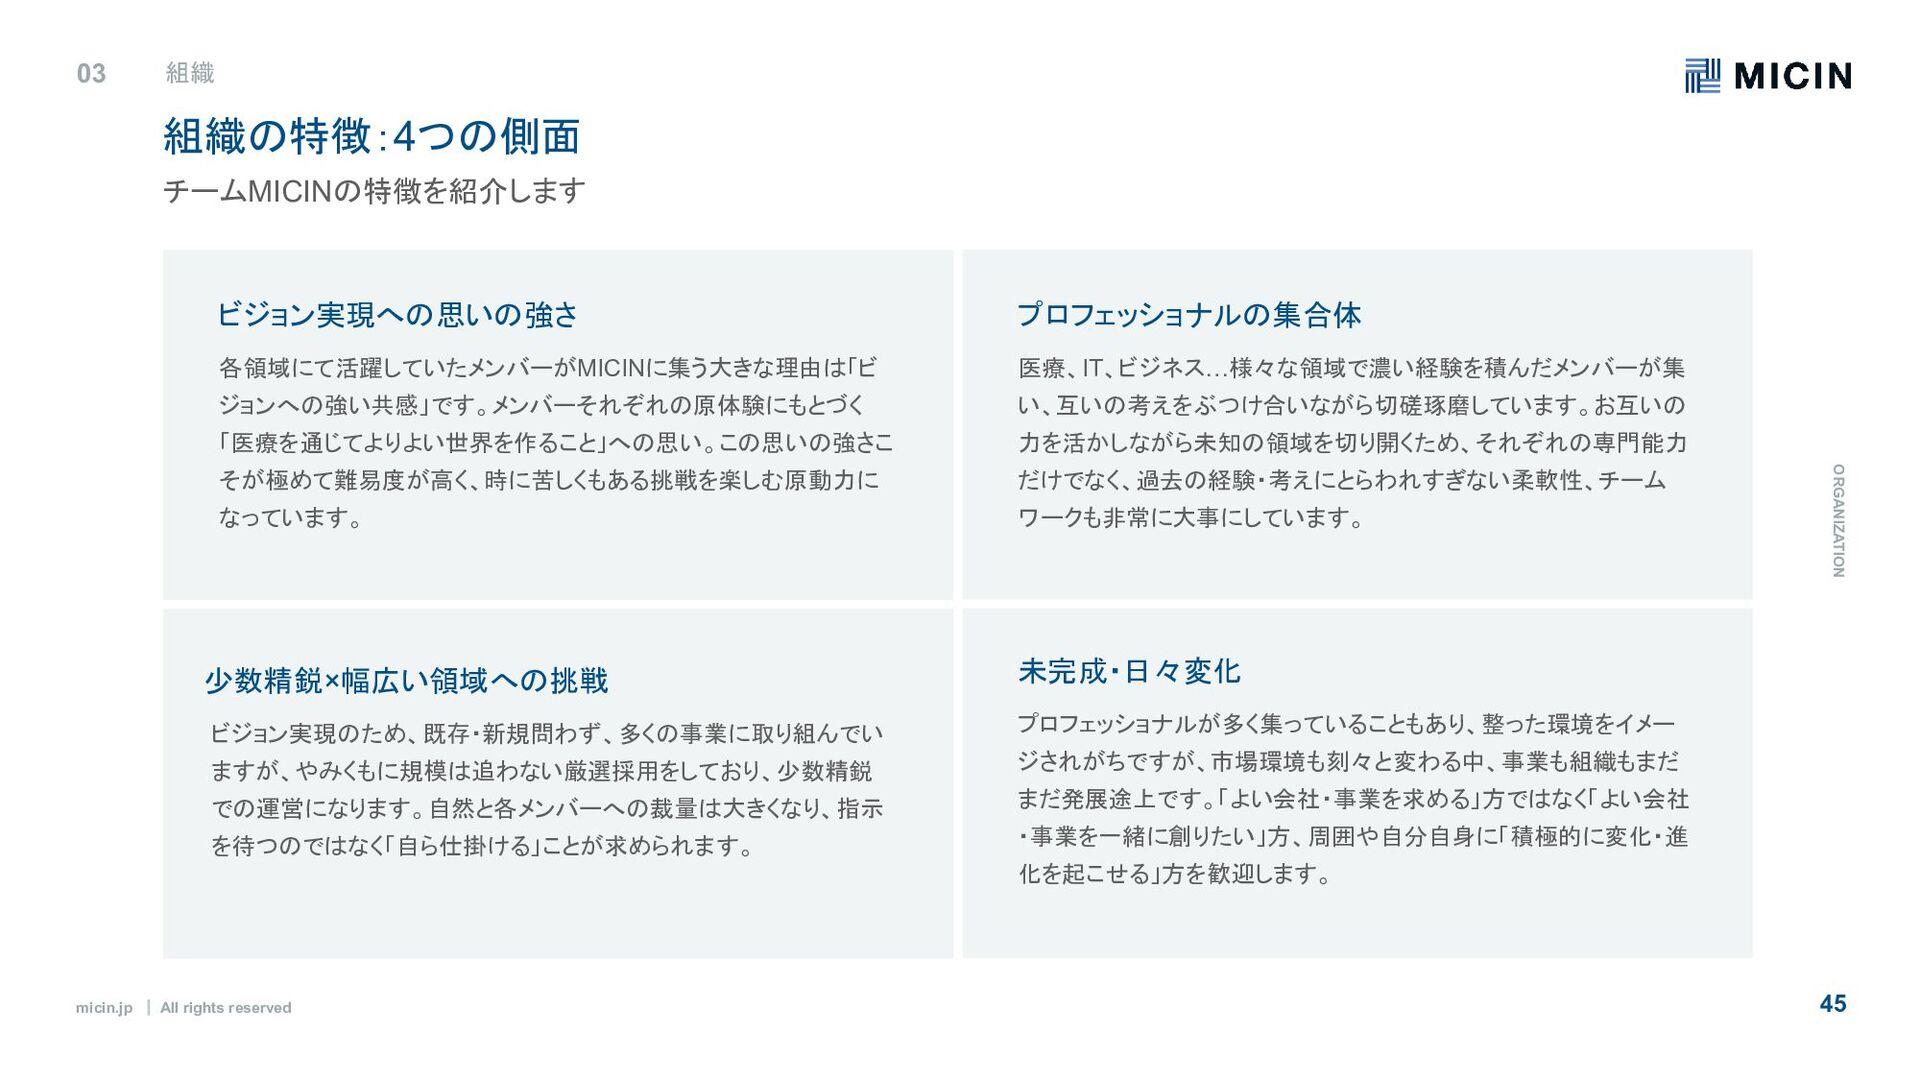 micin.jp ʛ All rights reserved 45 メンバー紹介 03 O R...